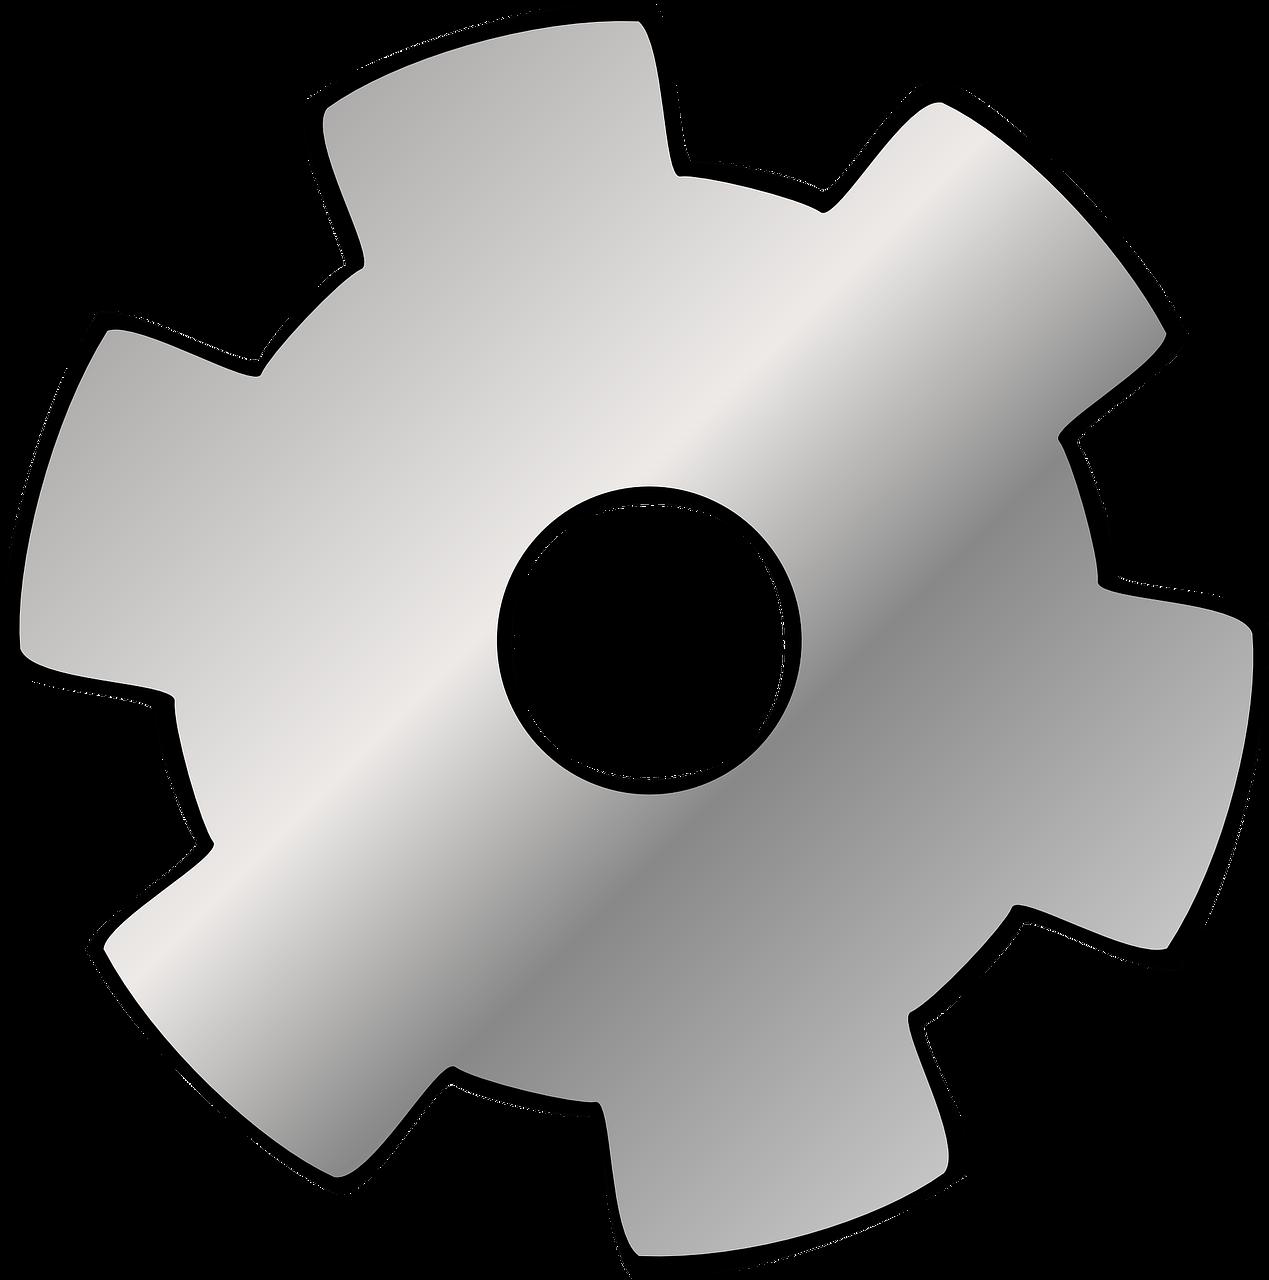 Cog Wheel Gear Chrome transparent image